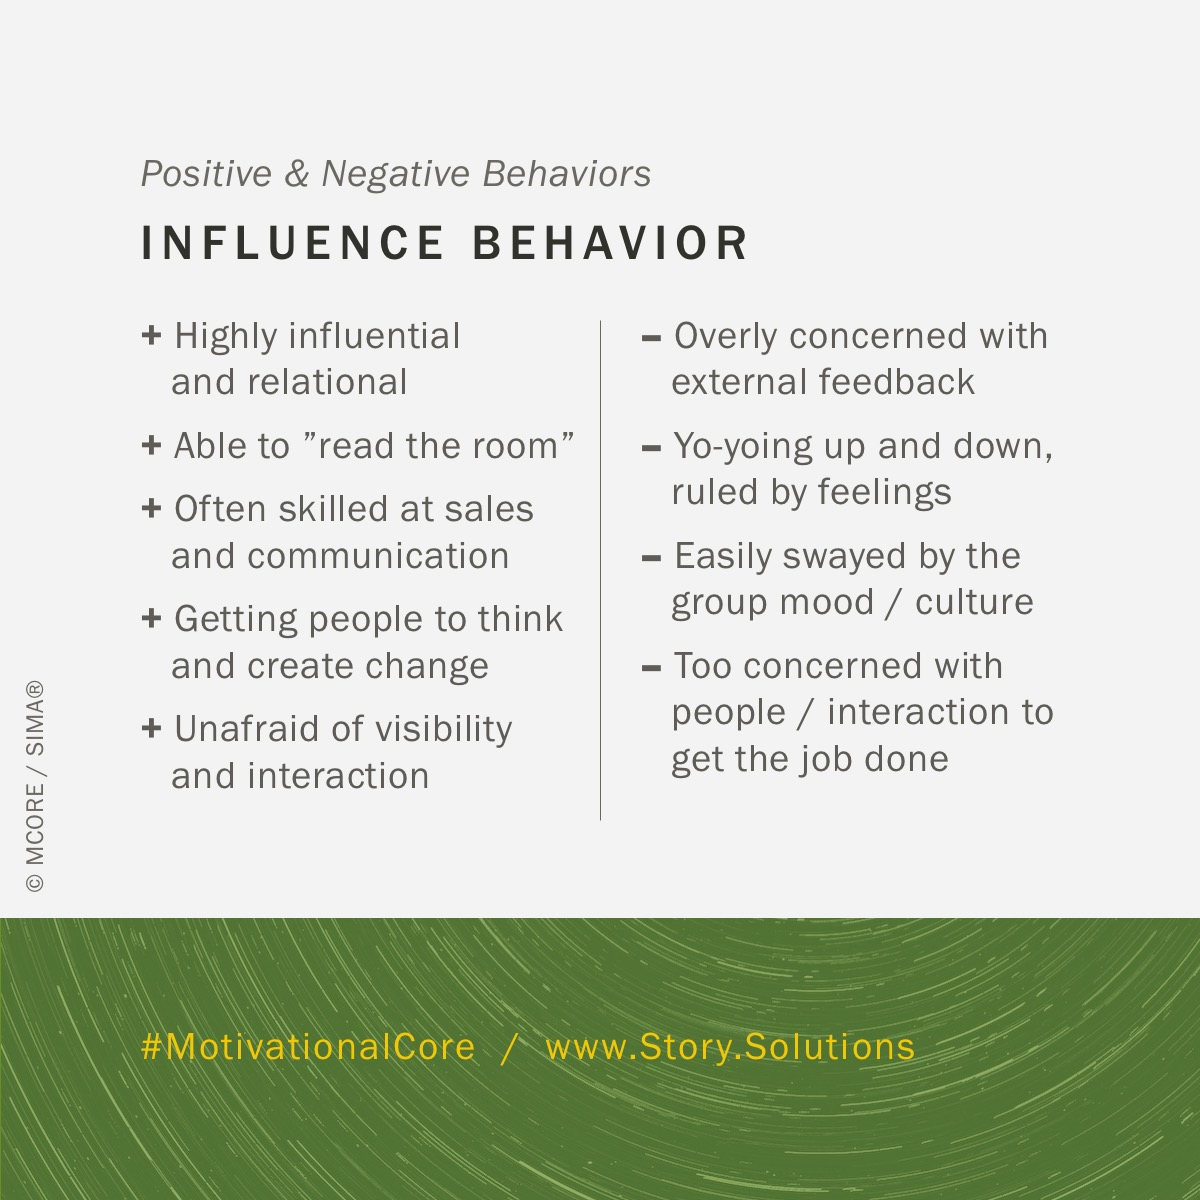 story-solutions-motivational-core-influence-behavior-5.jpg